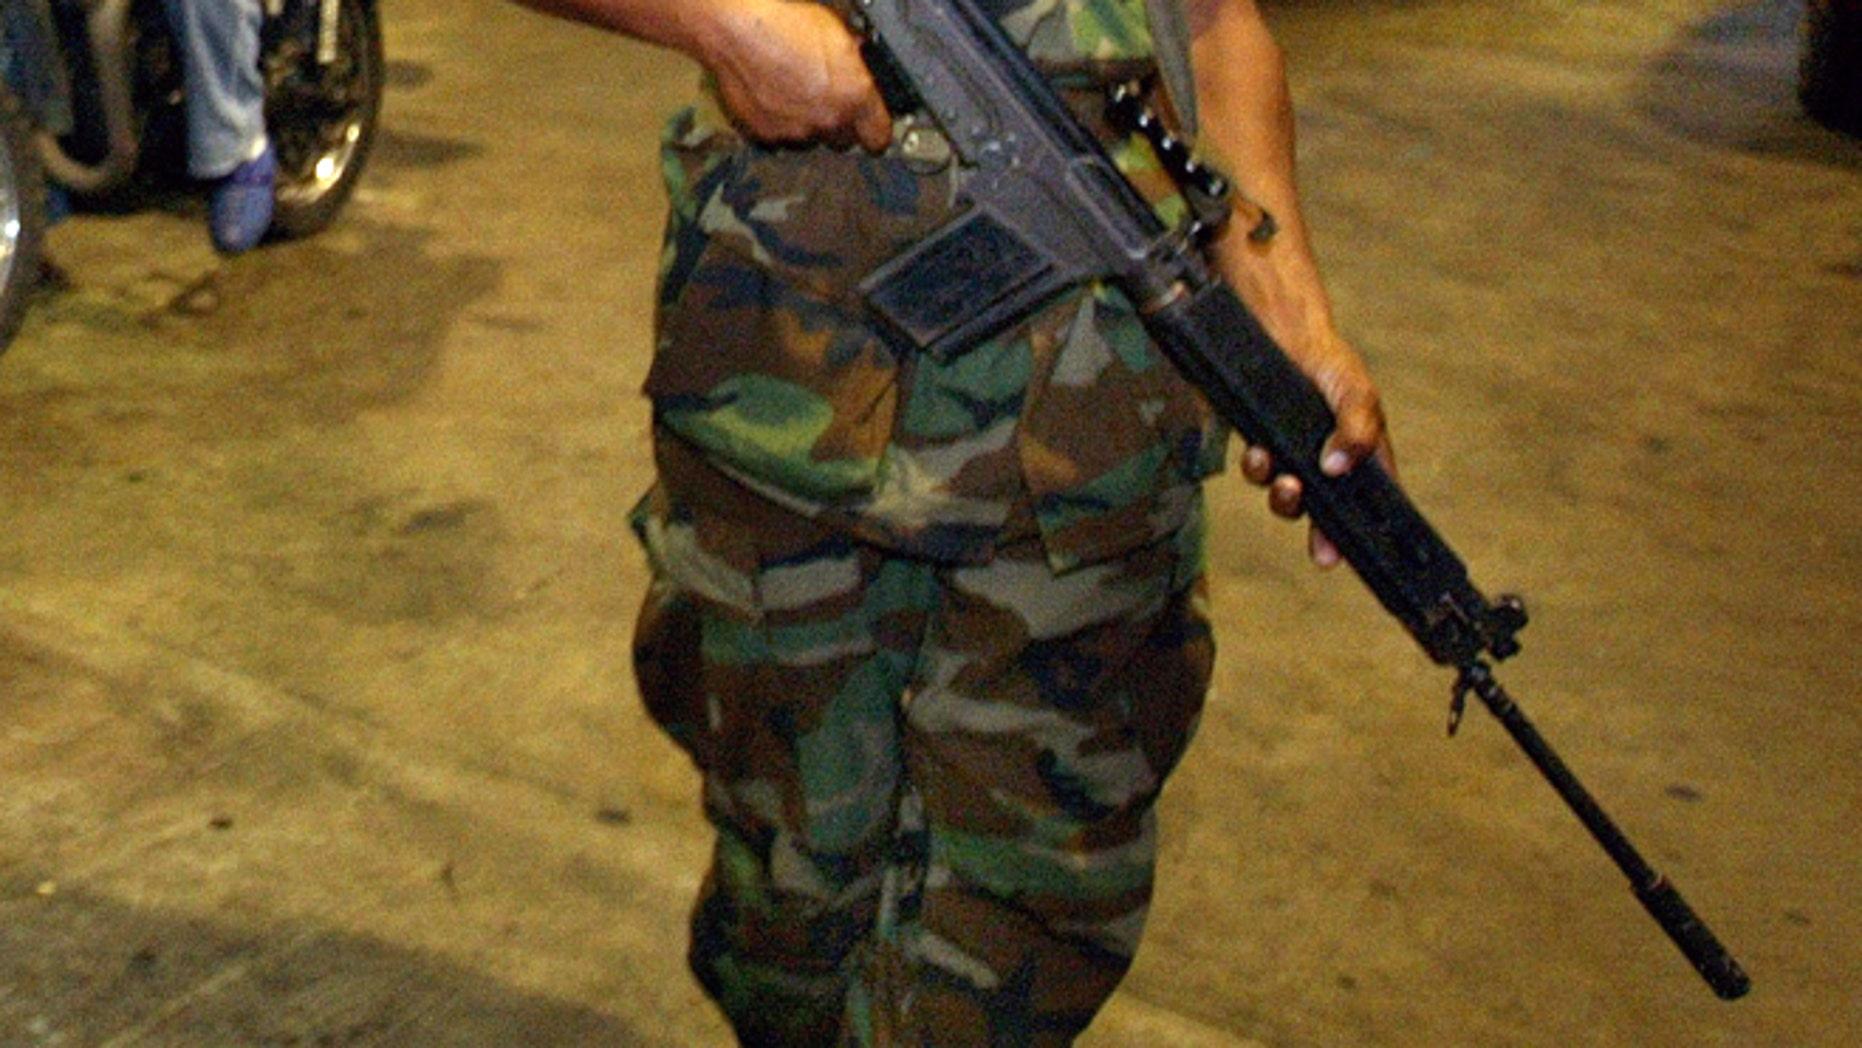 A Venezuelan soldier. (Photo by Paula Bronstein/Getty Images)